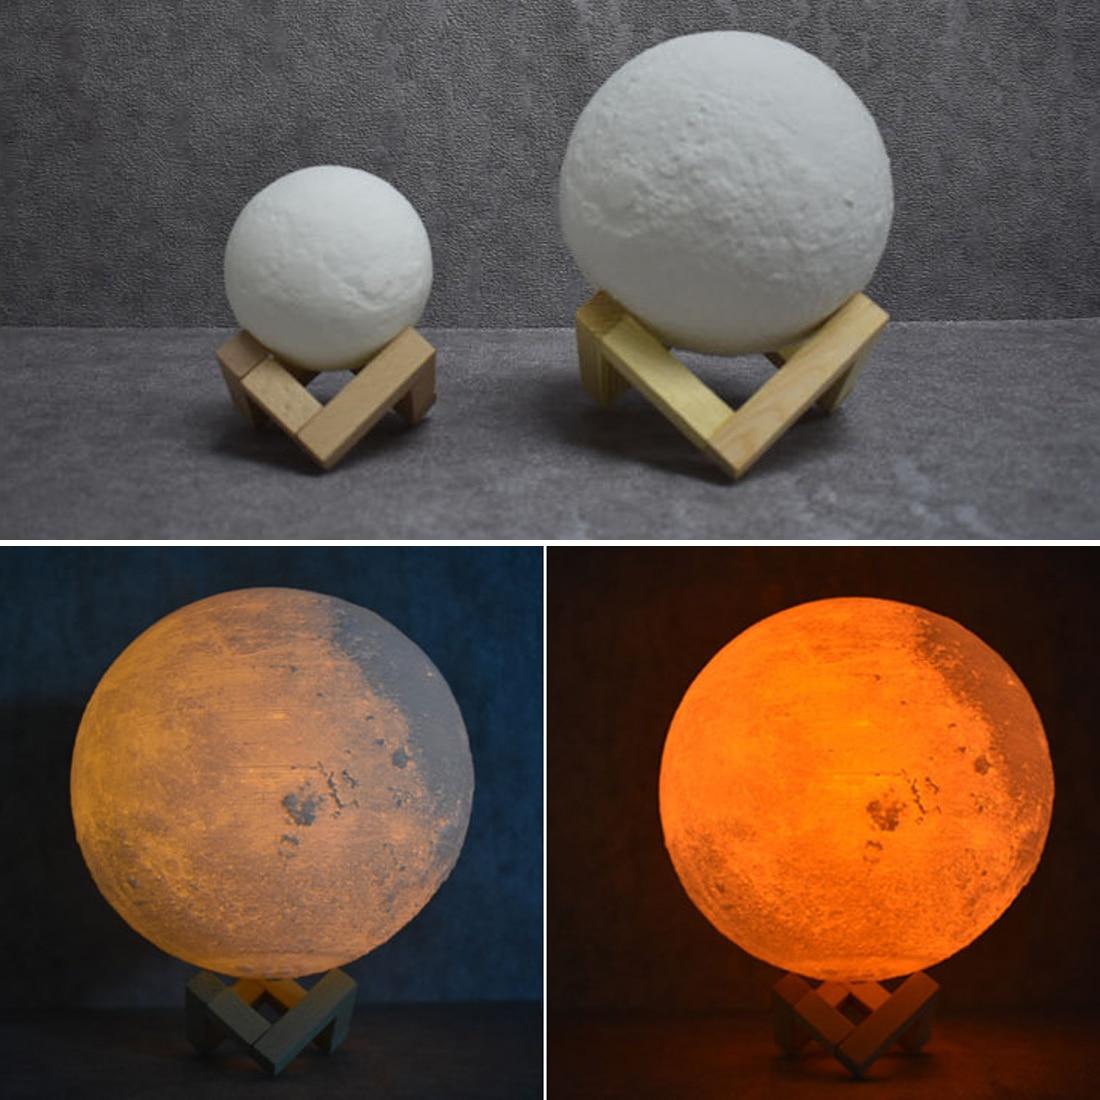 8cm 15cm 3D Print Moon Lamp USB LED Night Light Moonlight Gift Touch Sensor Color Changing Night Lamp Decor 3d print moonlight moonlight lamp led lamp light sensor moonlight moonlight lamp